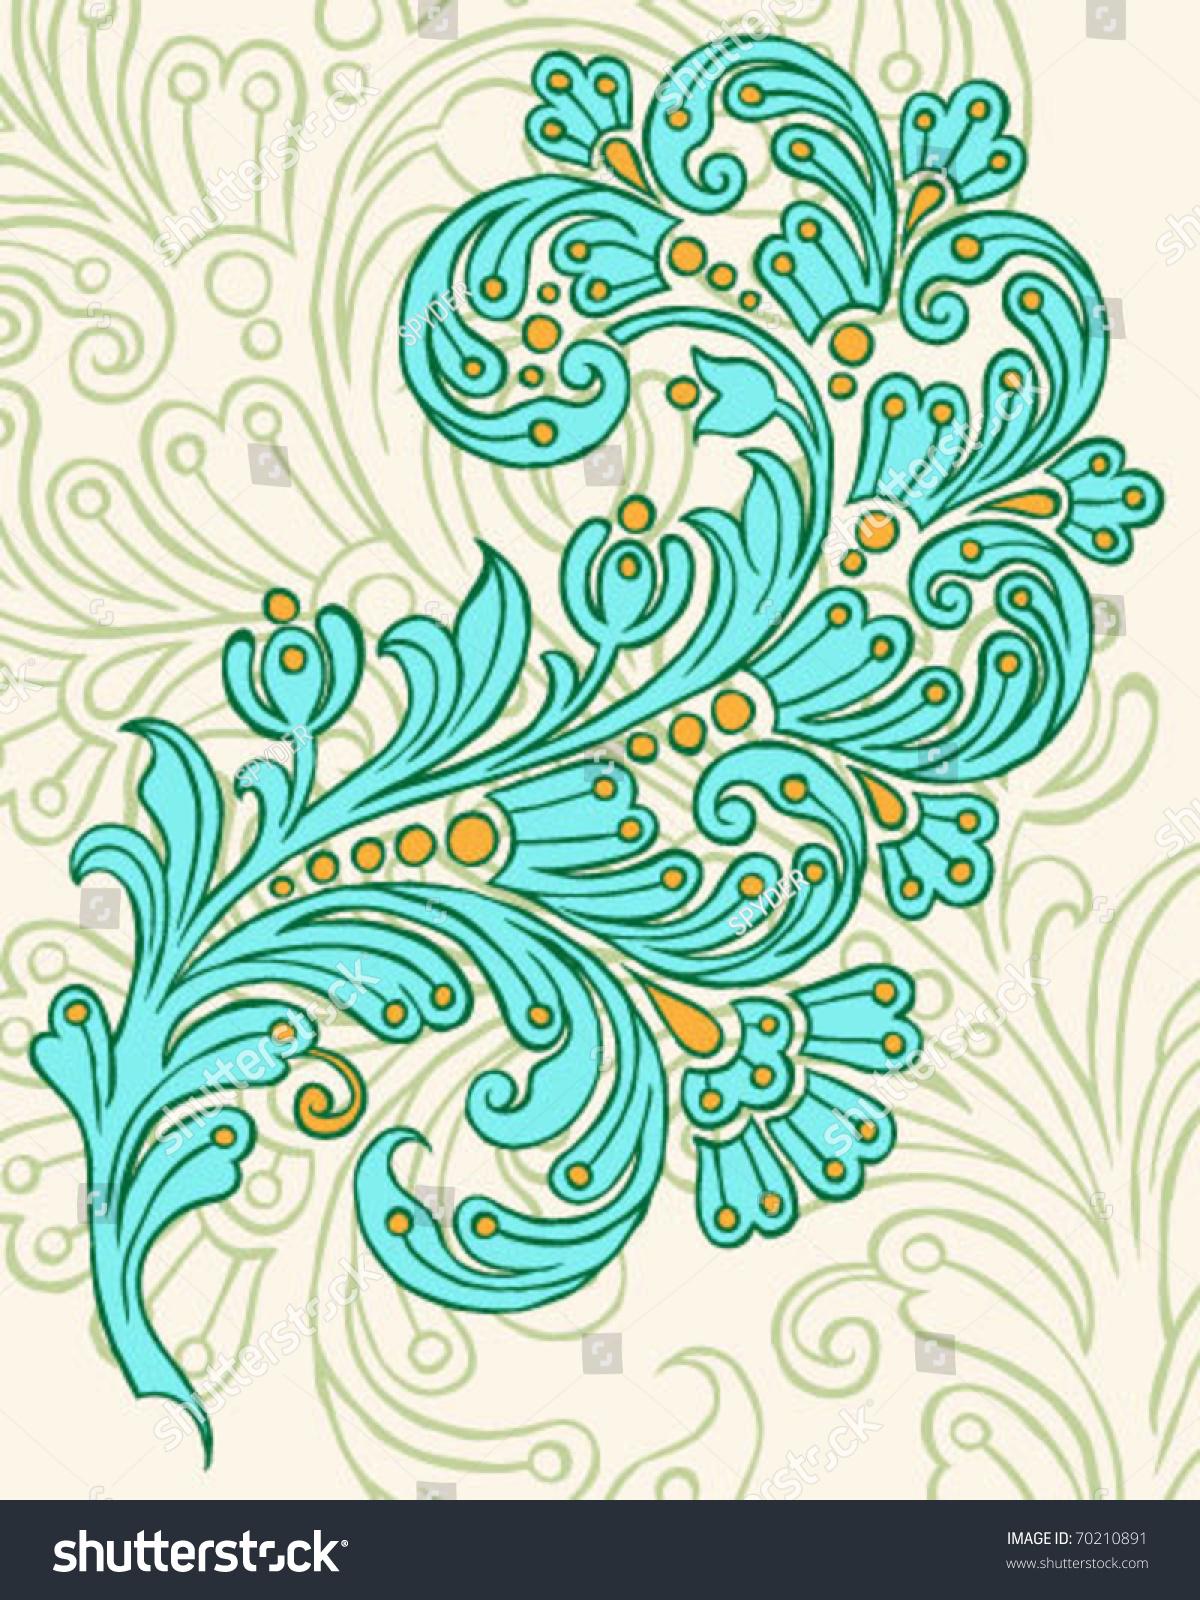 Hand Drawn Vector Paisley Design Stock Vector 70210891 - Shutterstock